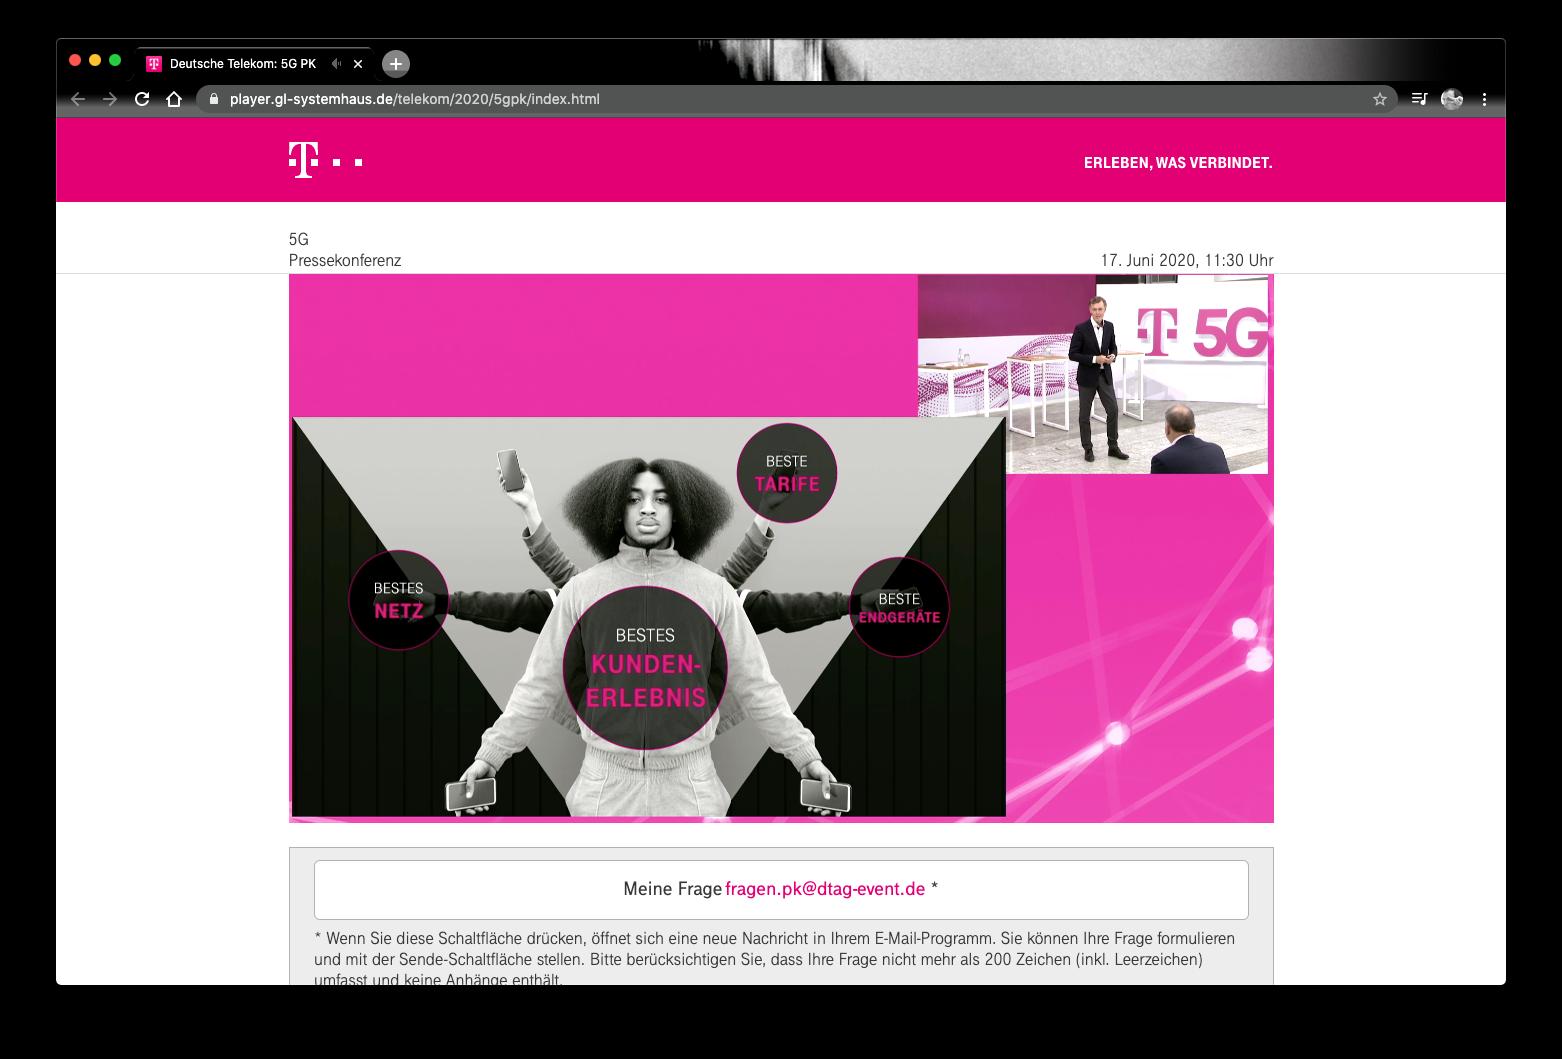 Telekom digital pressekonferenz online PK